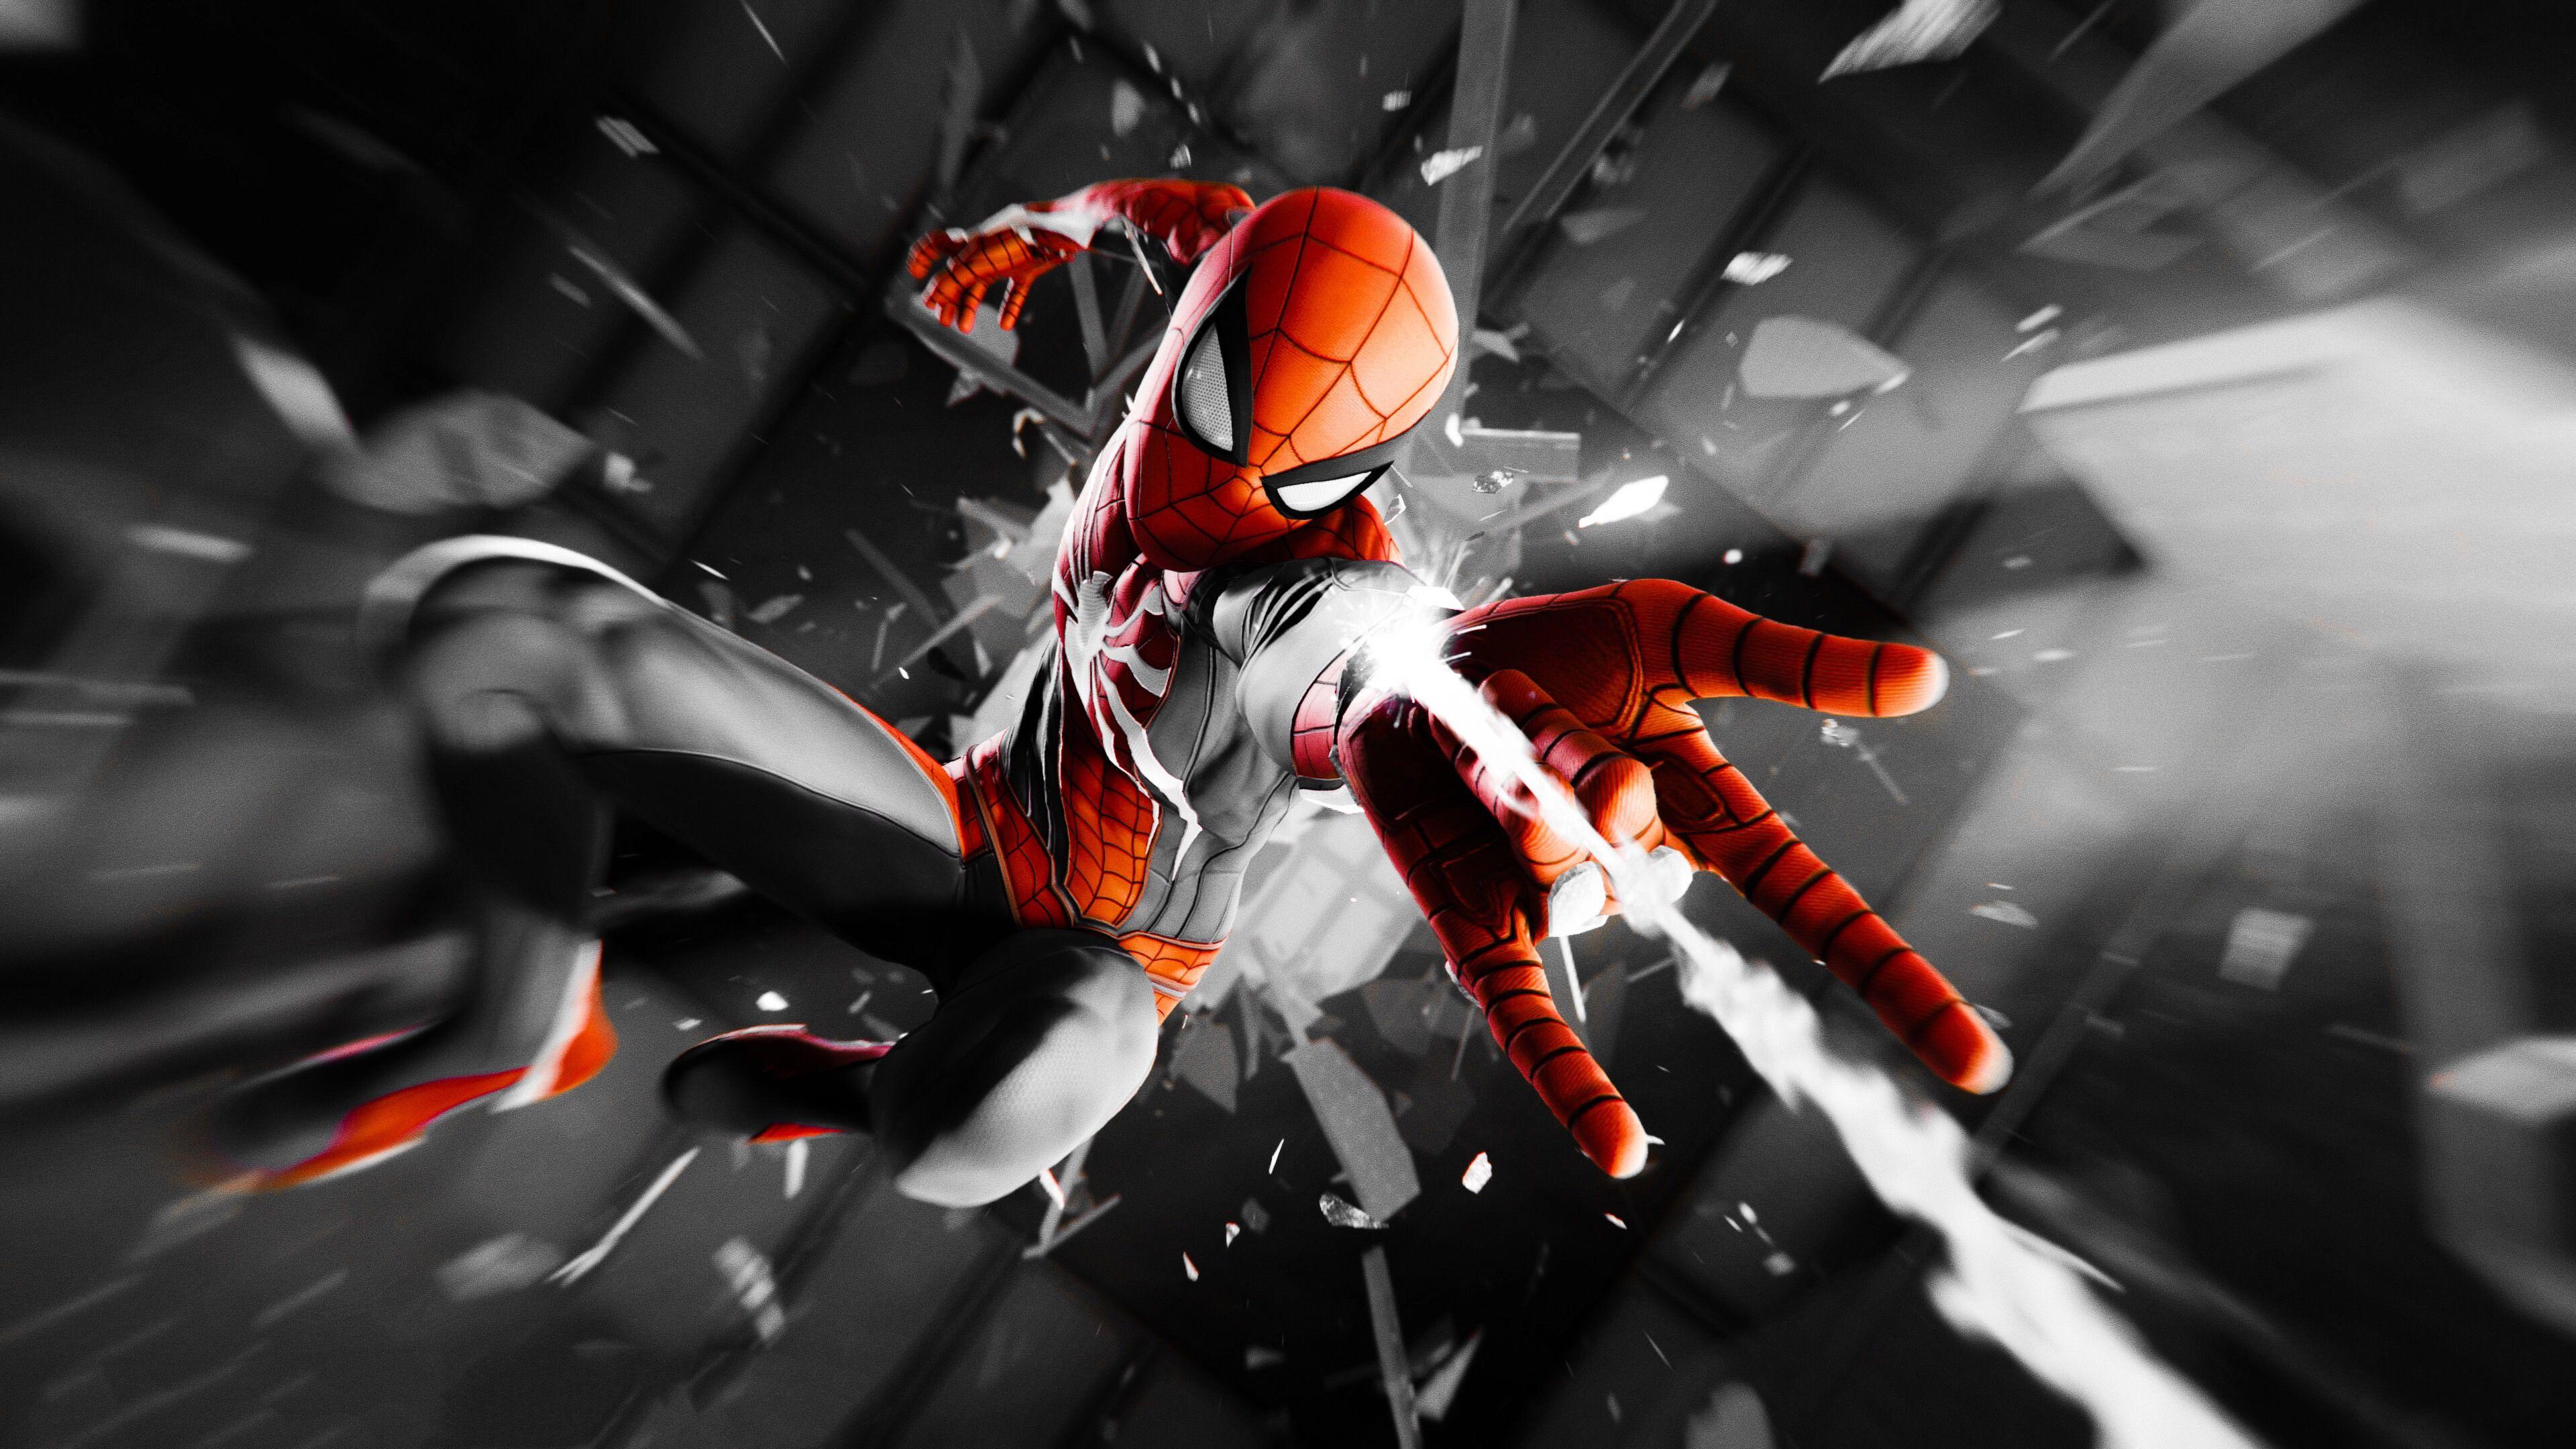 spiderman 4k monochrome 1543620351 - Spiderman 4k Monochrome - superheroes wallpapers, spiderman wallpapers, hd-wallpapers, digital art wallpapers, artwork wallpapers, artist wallpapers, 4k-wallpapers